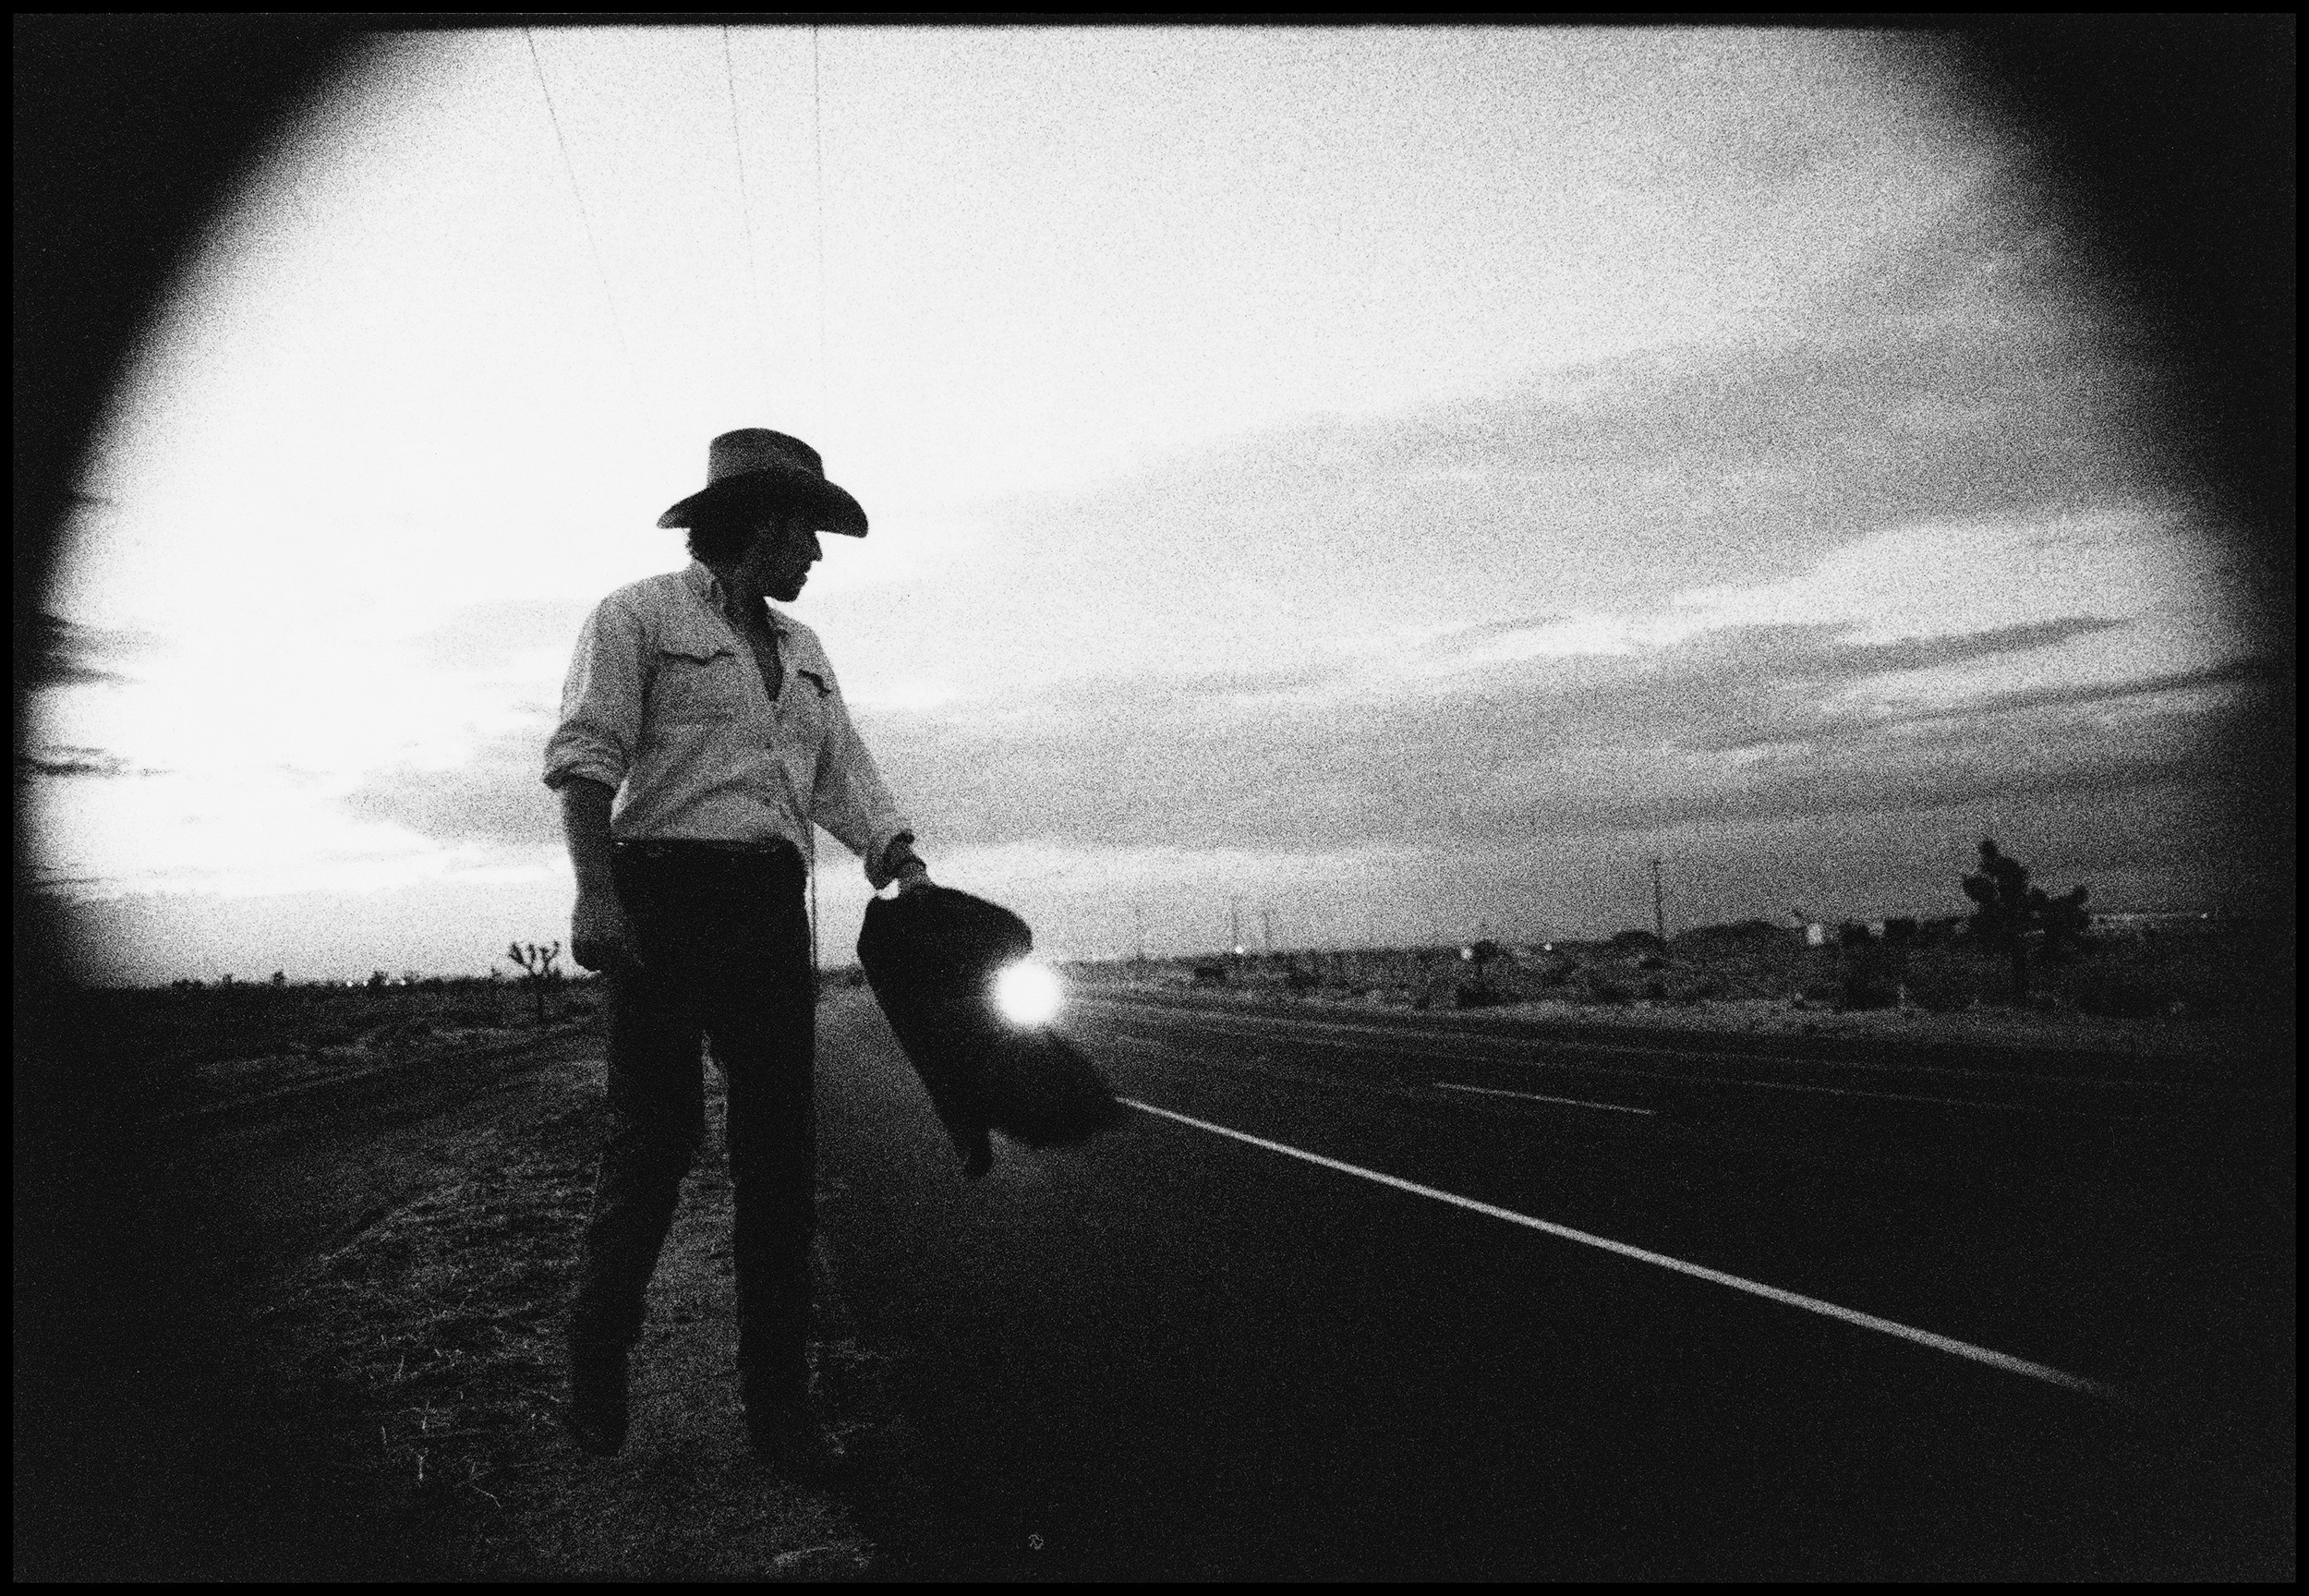 Bruce on Highway Must include Photo Credit Pamela Springsteen_80%2.jpg